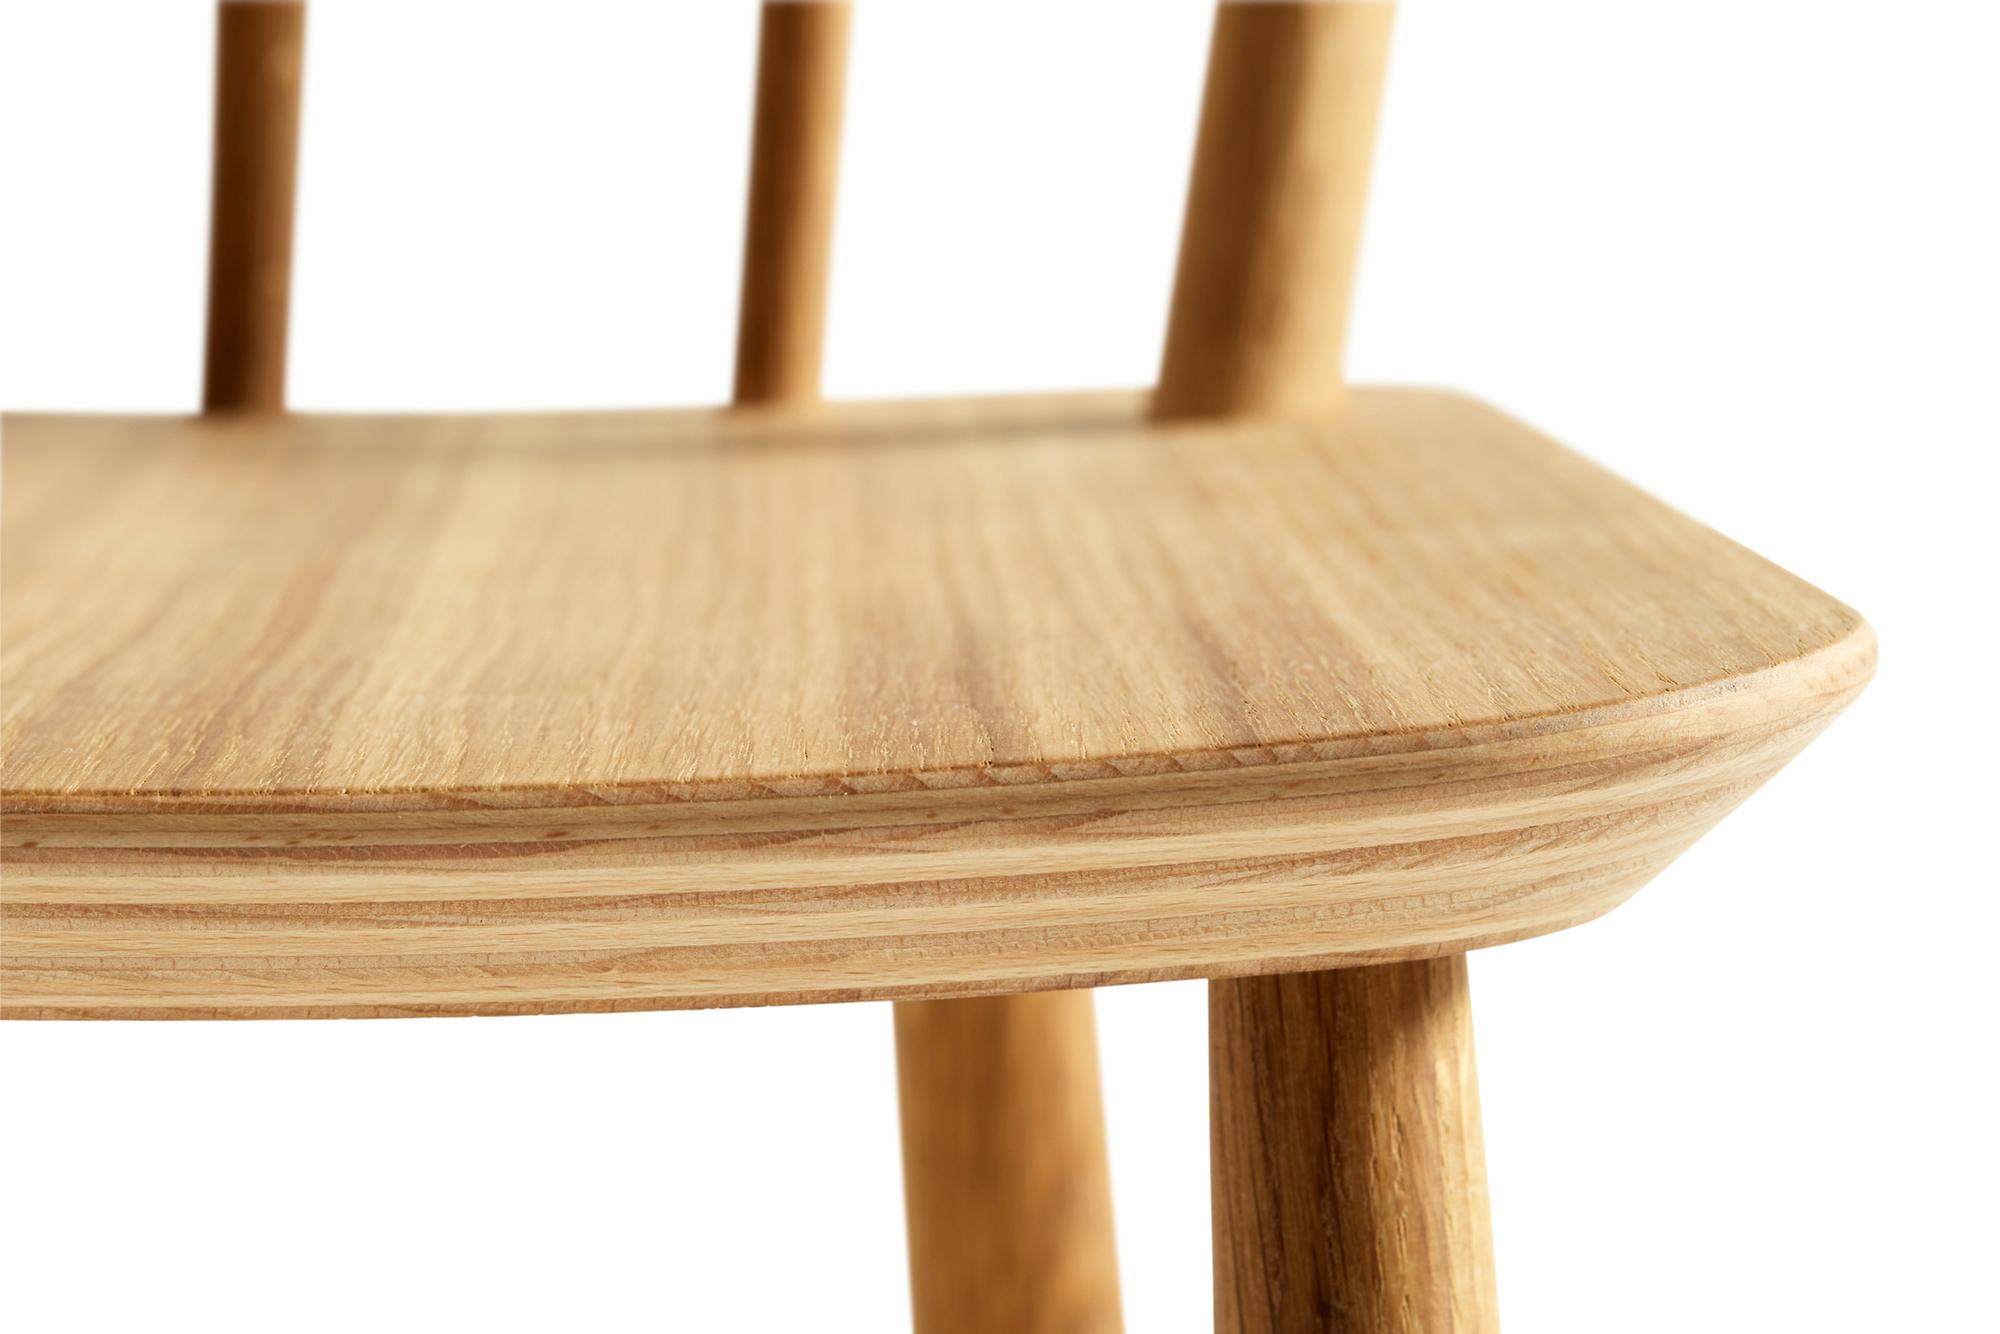 J41 / J 41 Chair Stuhl Eiche Hay